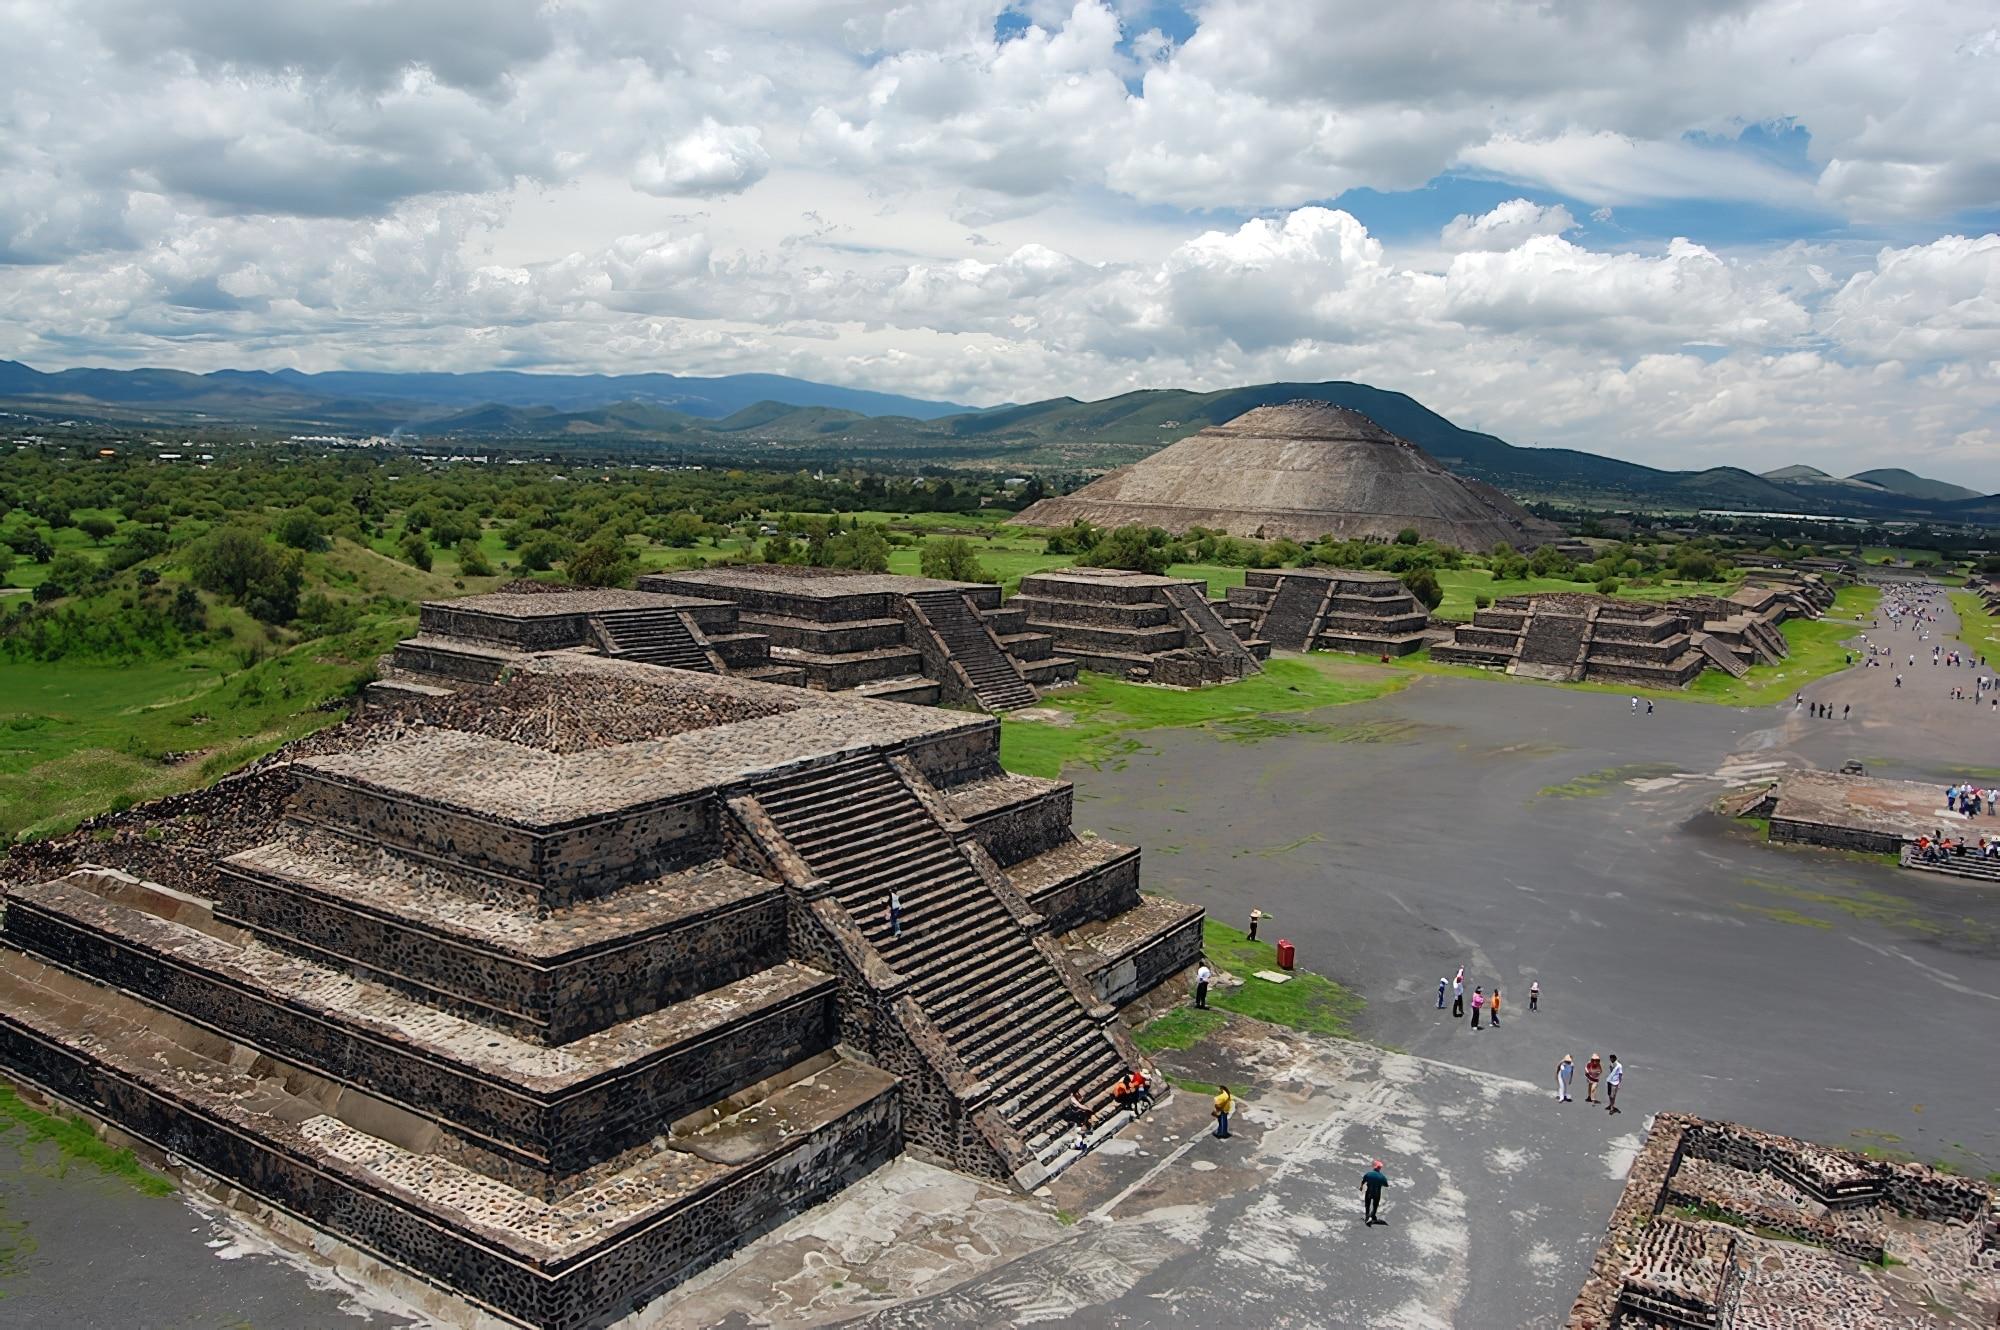 Pyramides de Teotihuacan à Mexico